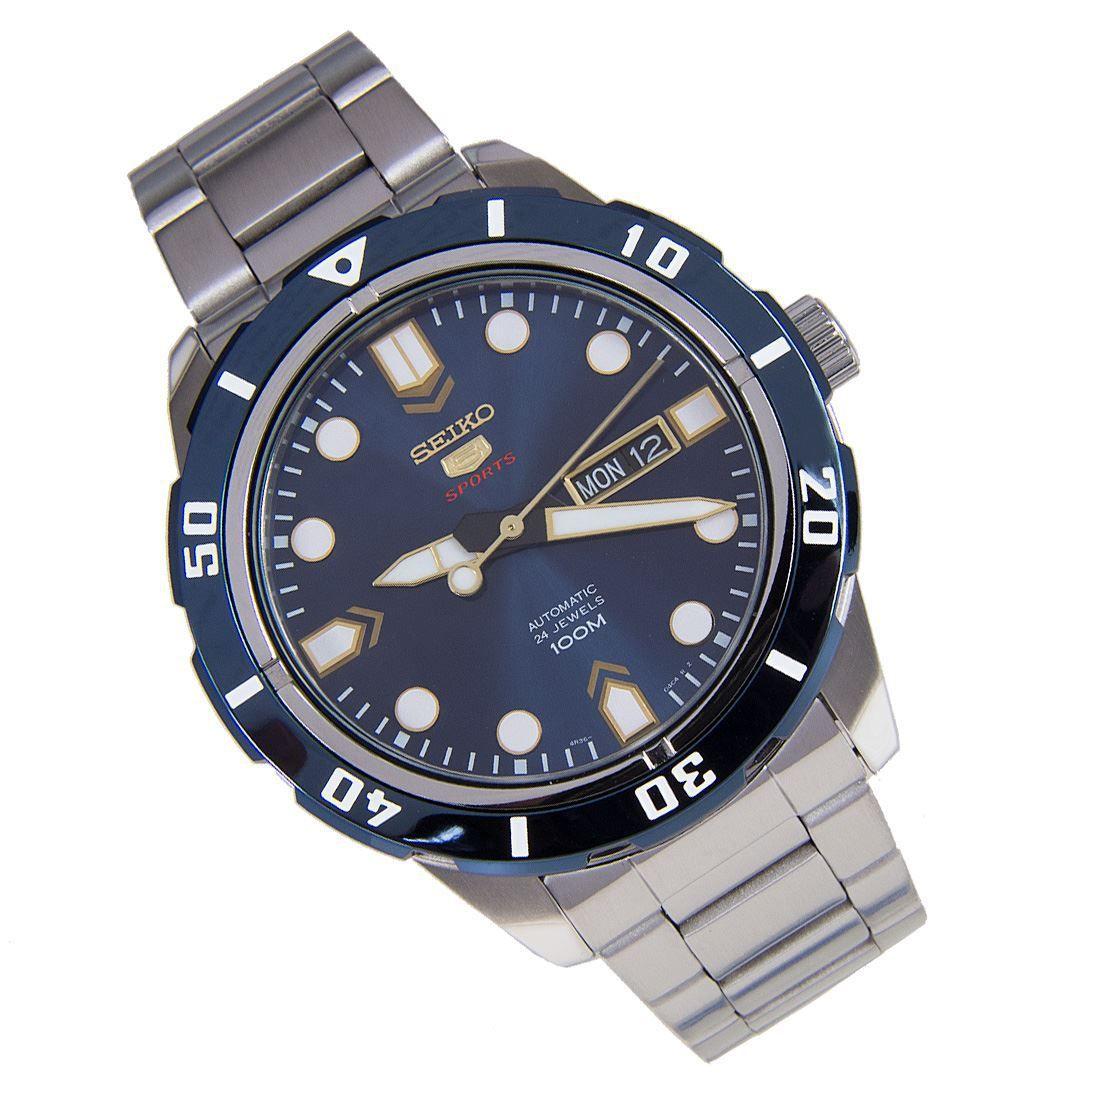 SRP677K1 SRP677 Seiko 5 Sports Automatic Watch Seiko 5